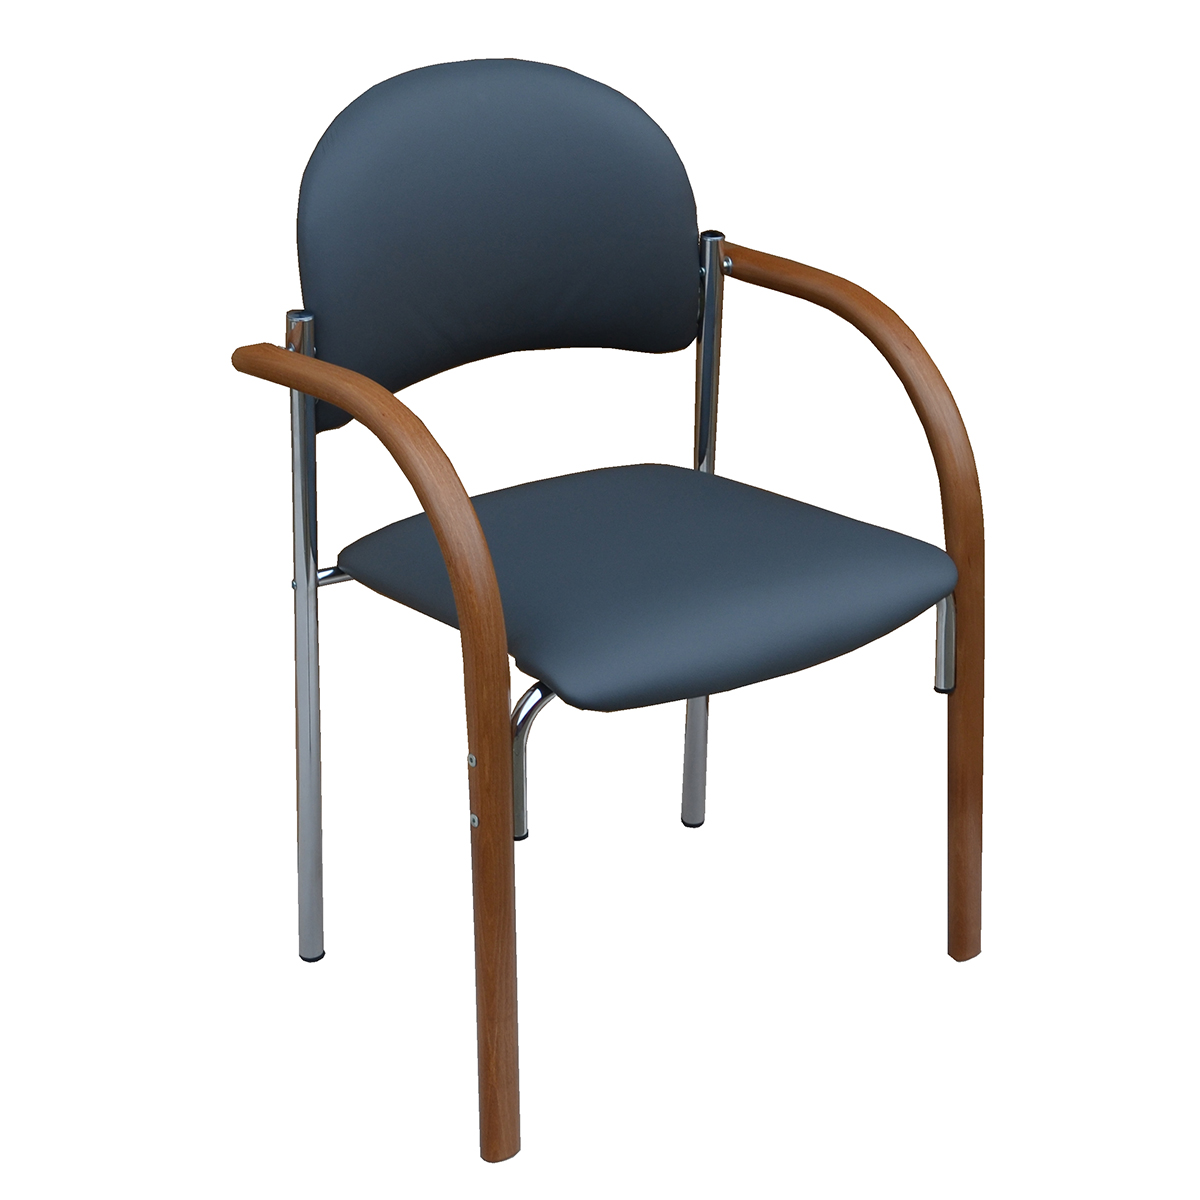 Bibiana S333-D. Meeting room chair ...  sc 1 st  KODRETA furniture & Bibiana conference chair meeting room chair wider chair